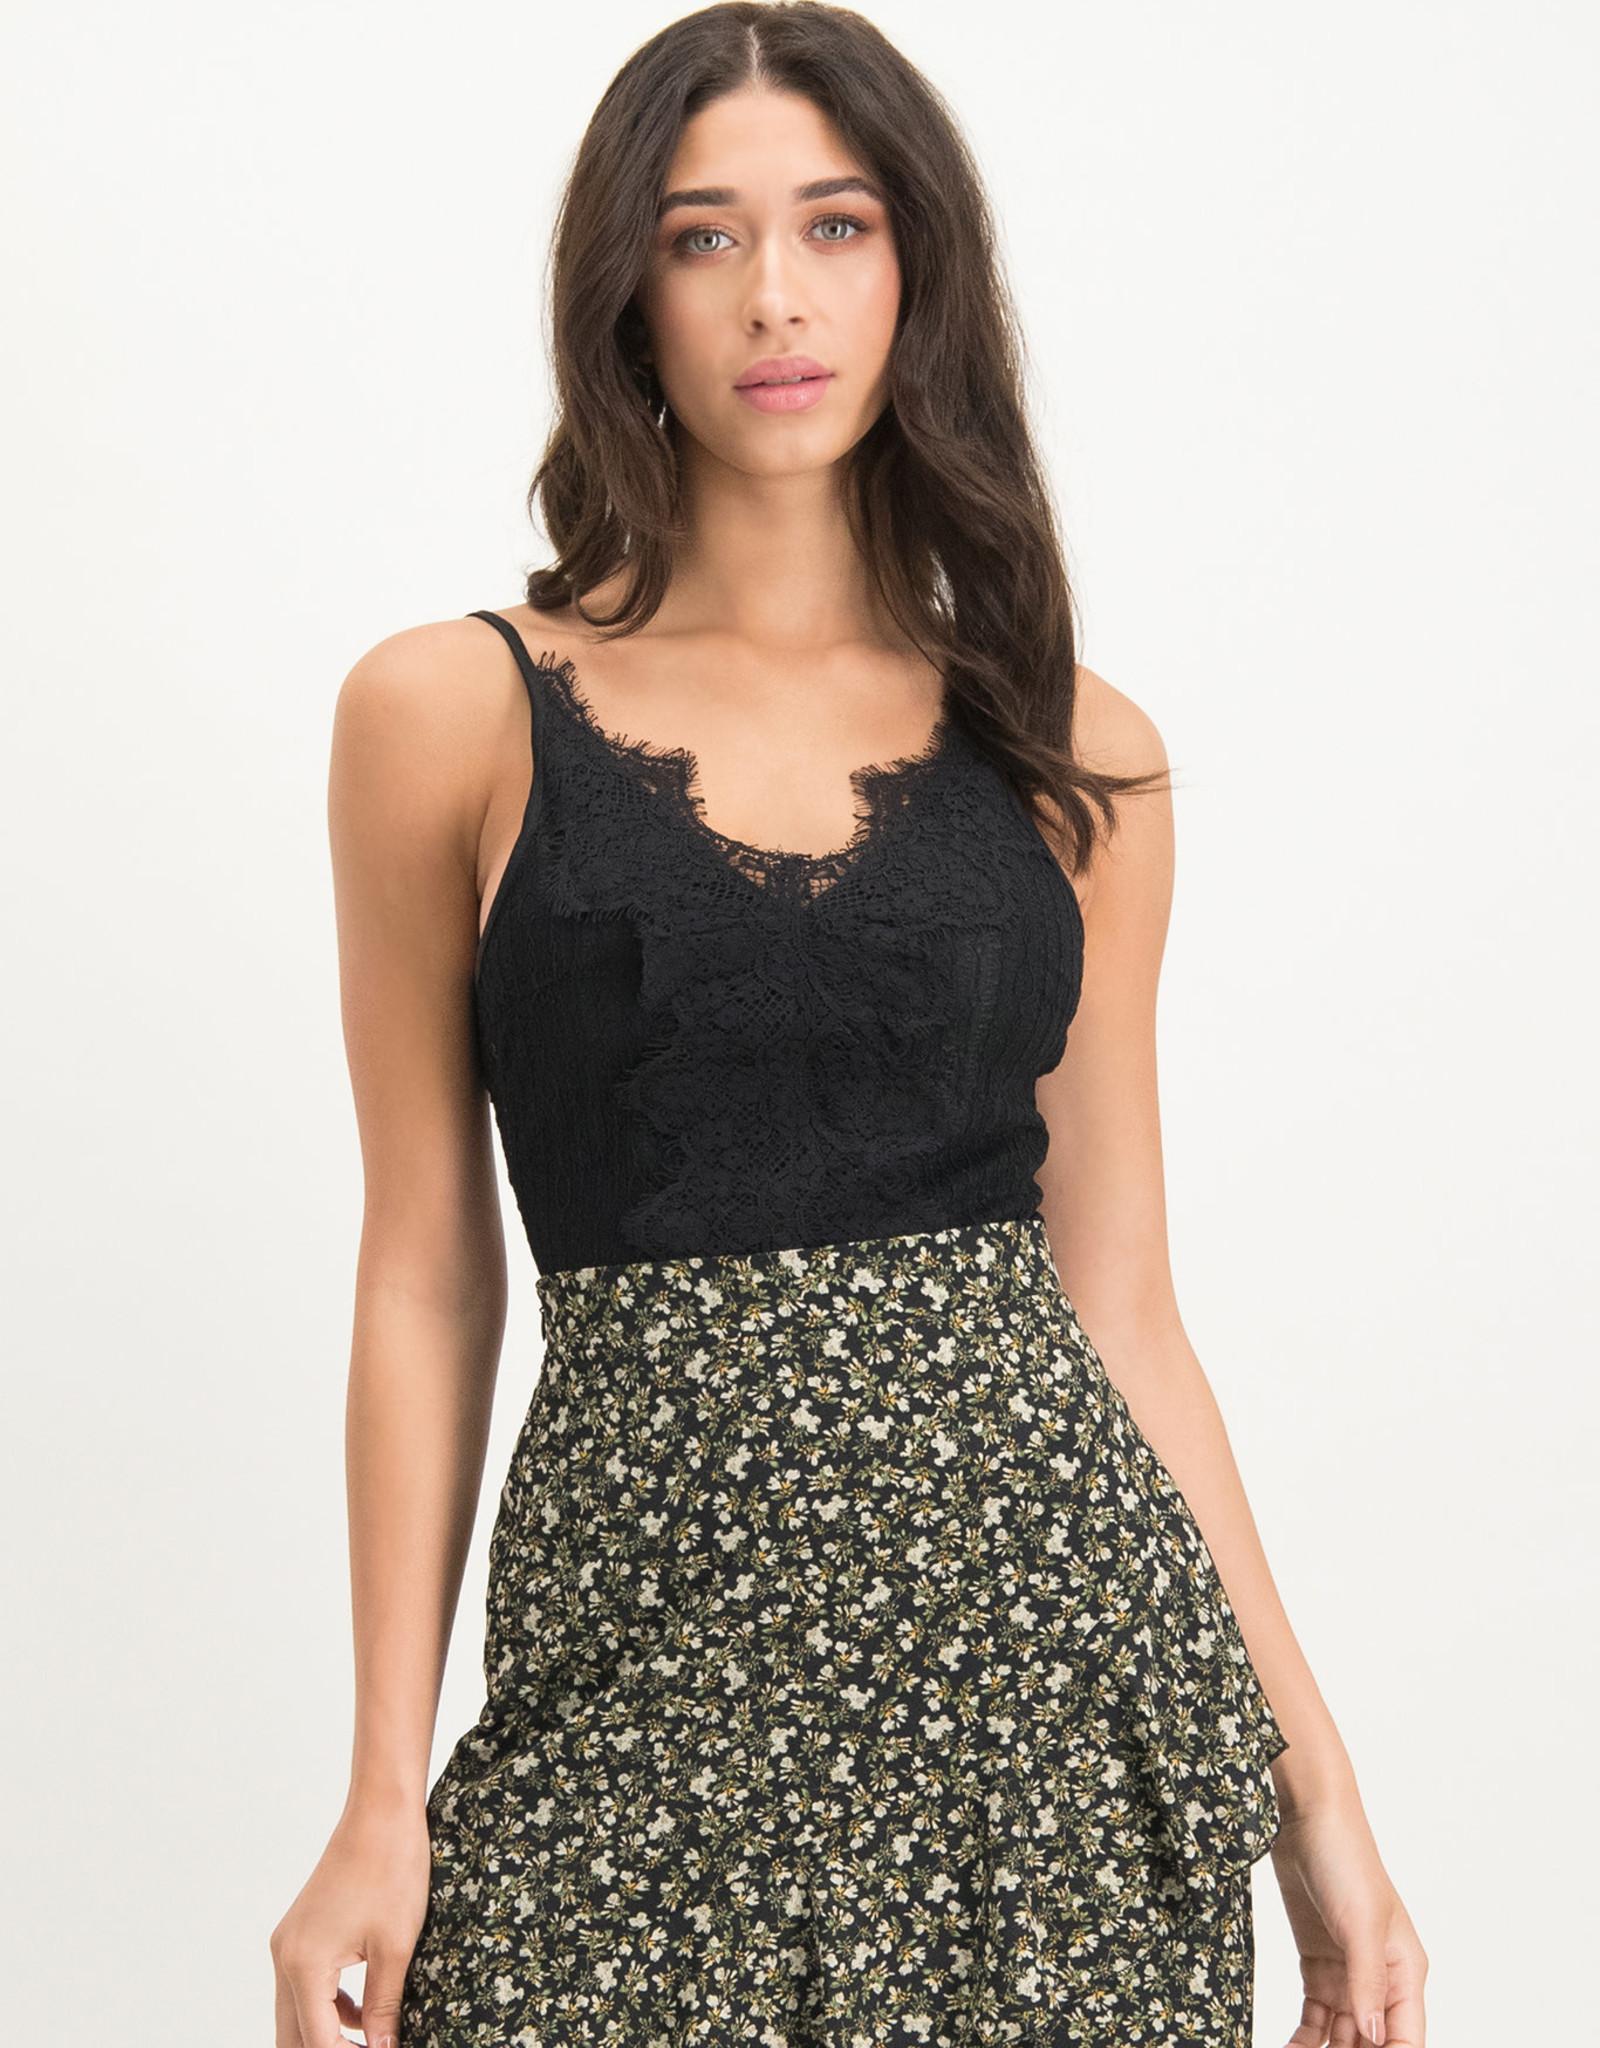 Lofty Manner Bodysuit Laury Black